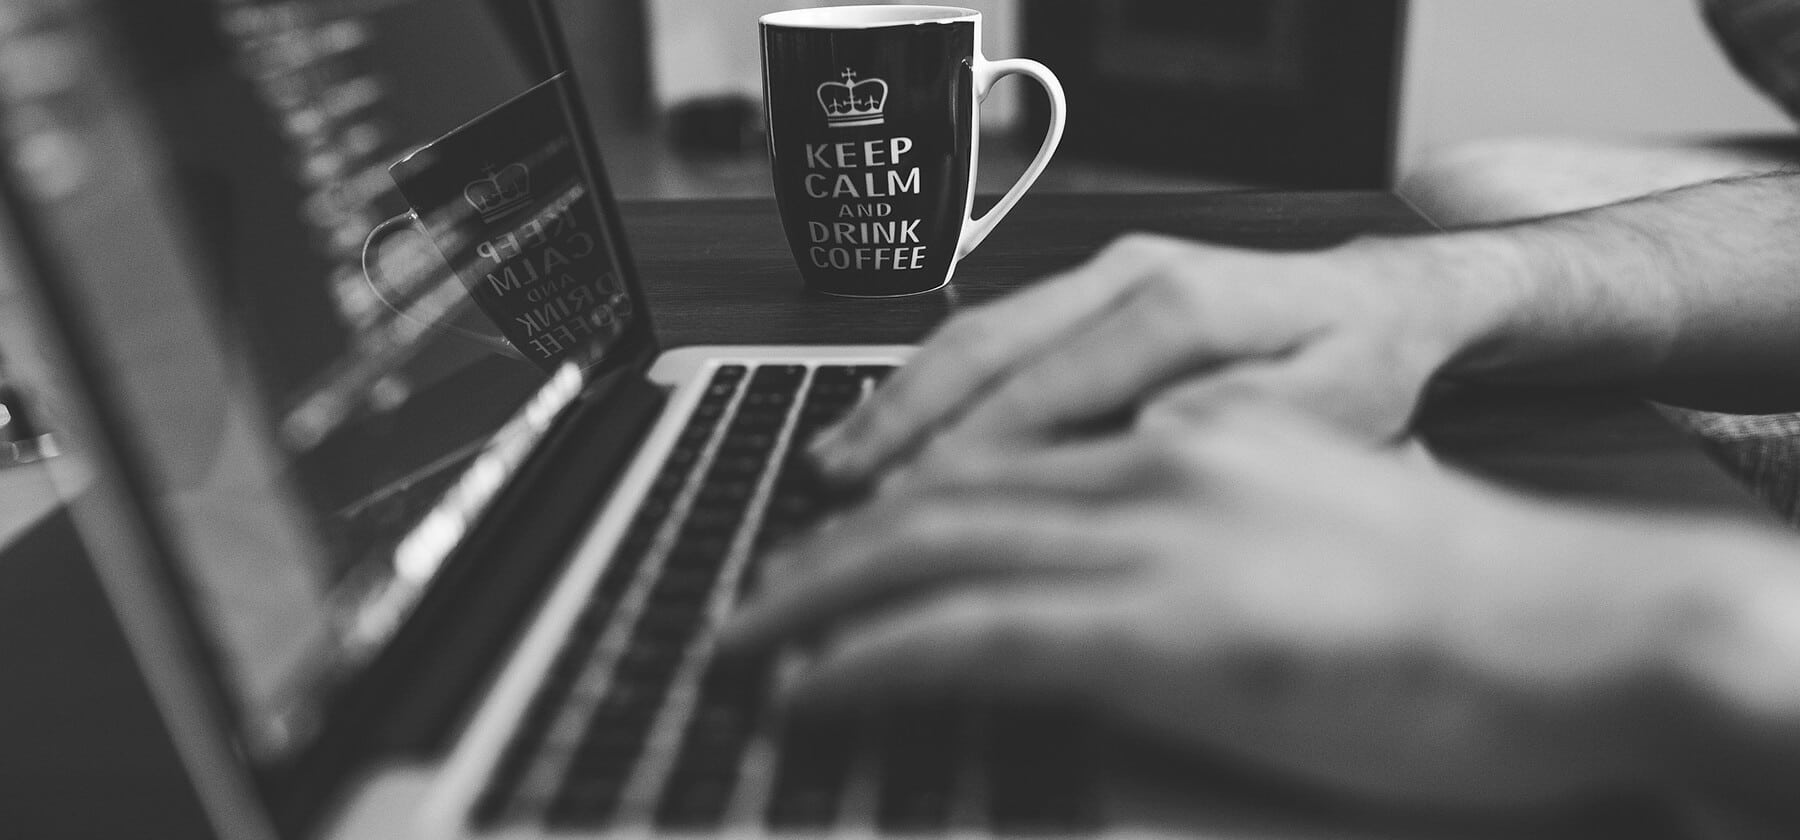 20 cursos de programación gratis online